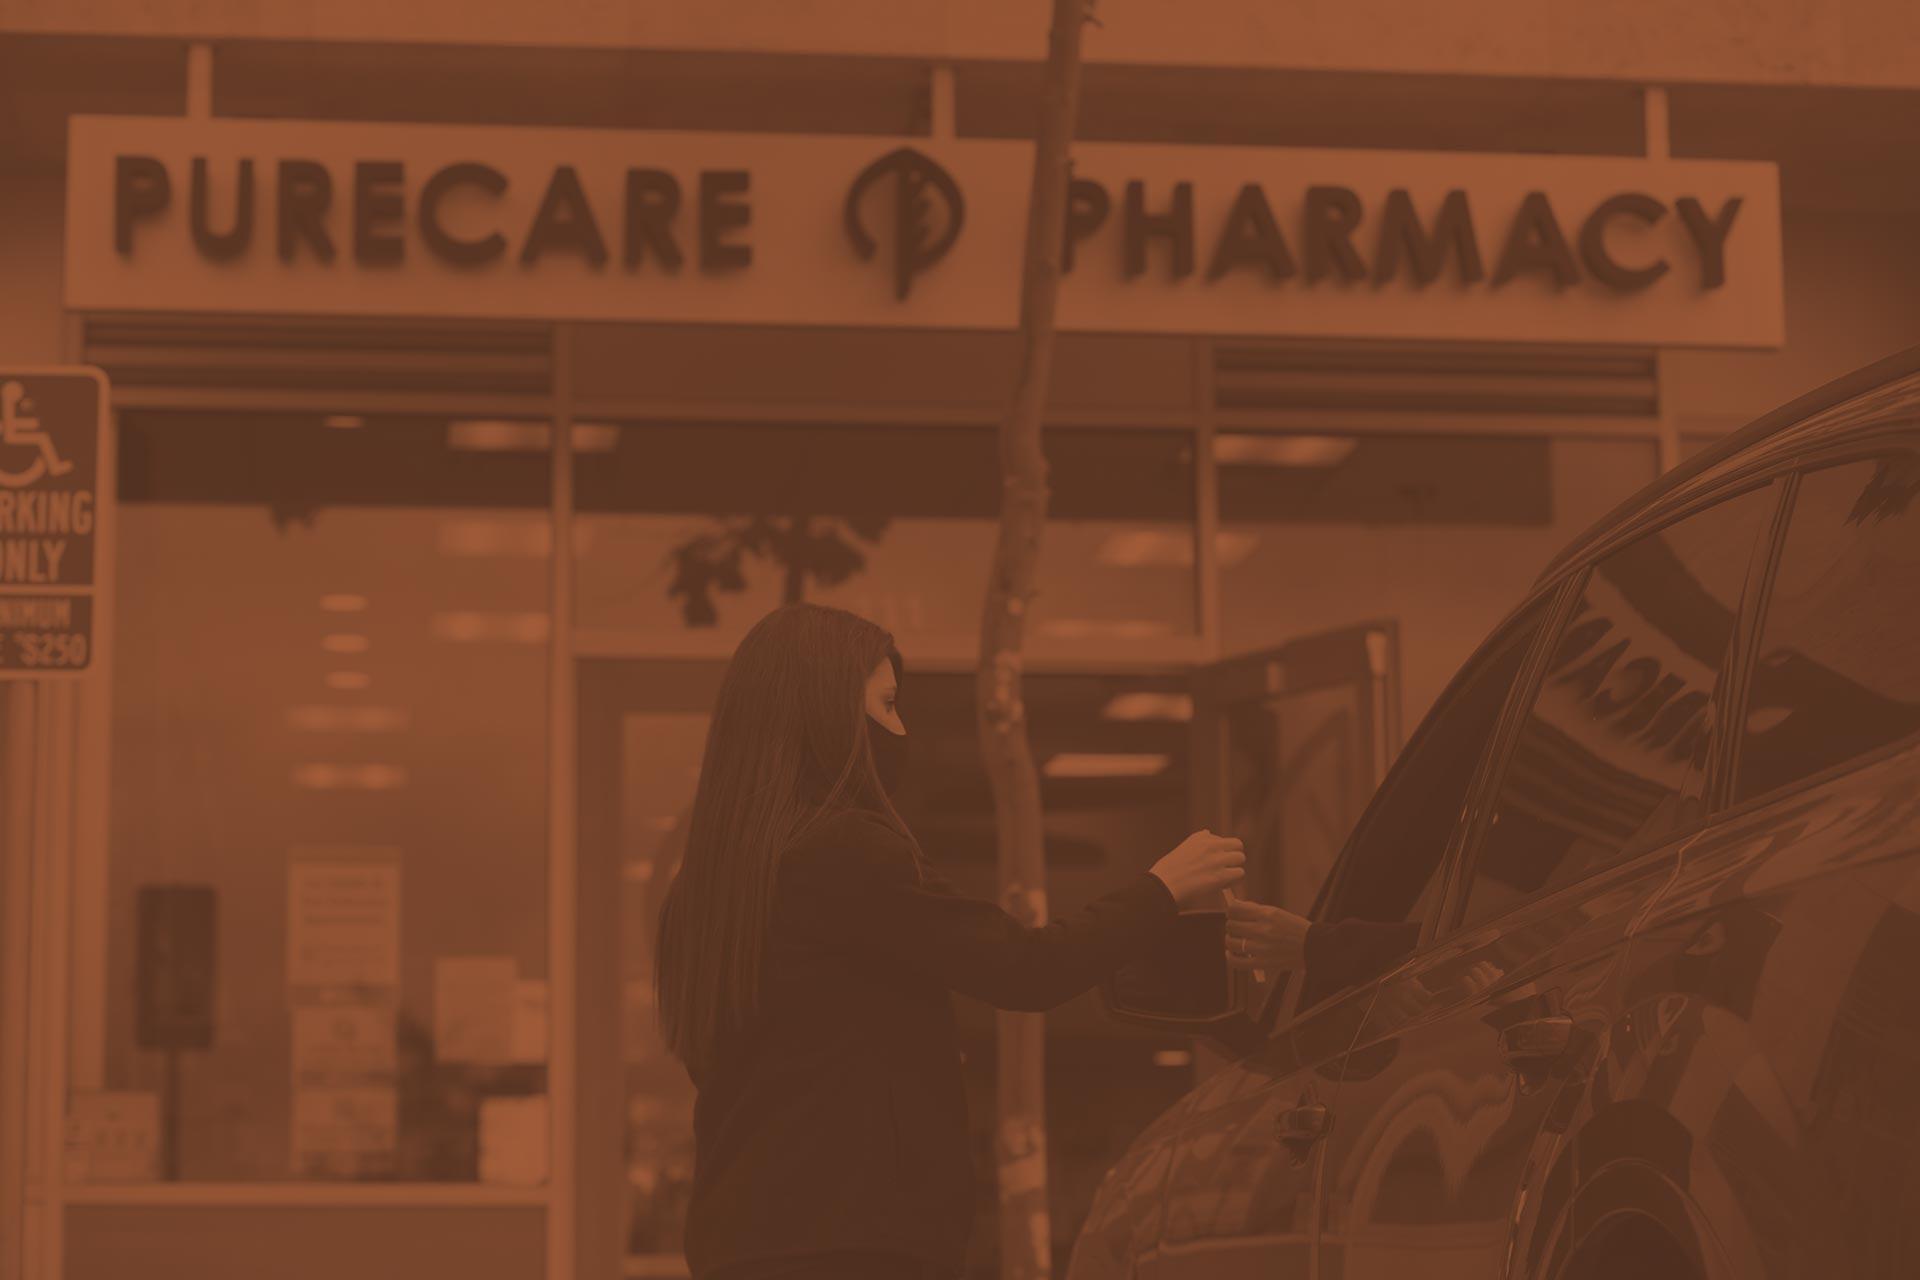 PureCare Pharmacy & Clinic in San Diego, CA